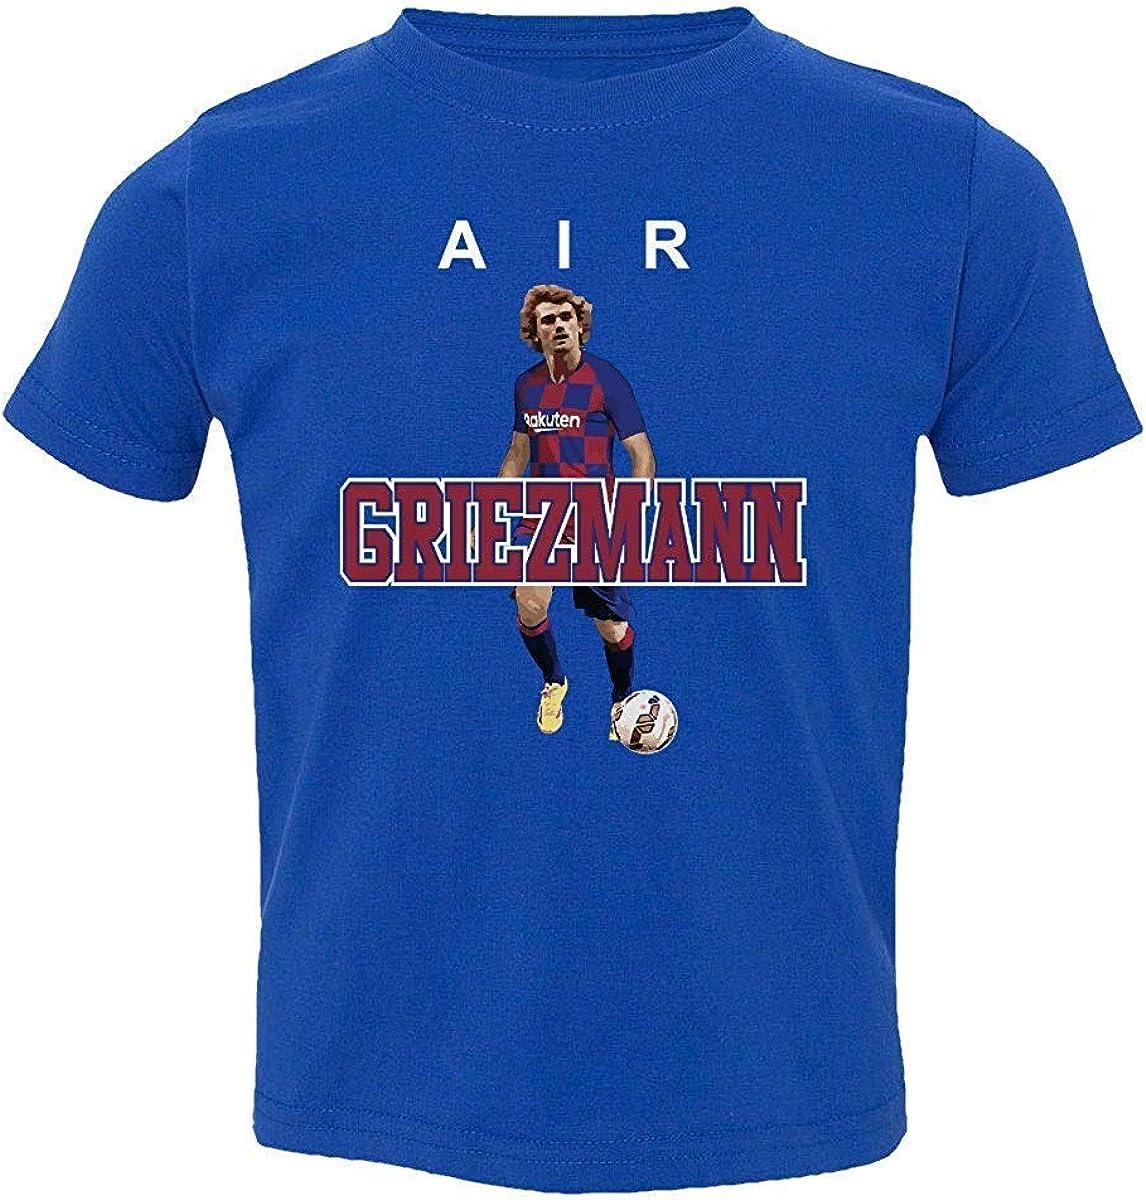 Mbefore Nueva Camiseta de fútbol Barcelona Air Griezmann ...